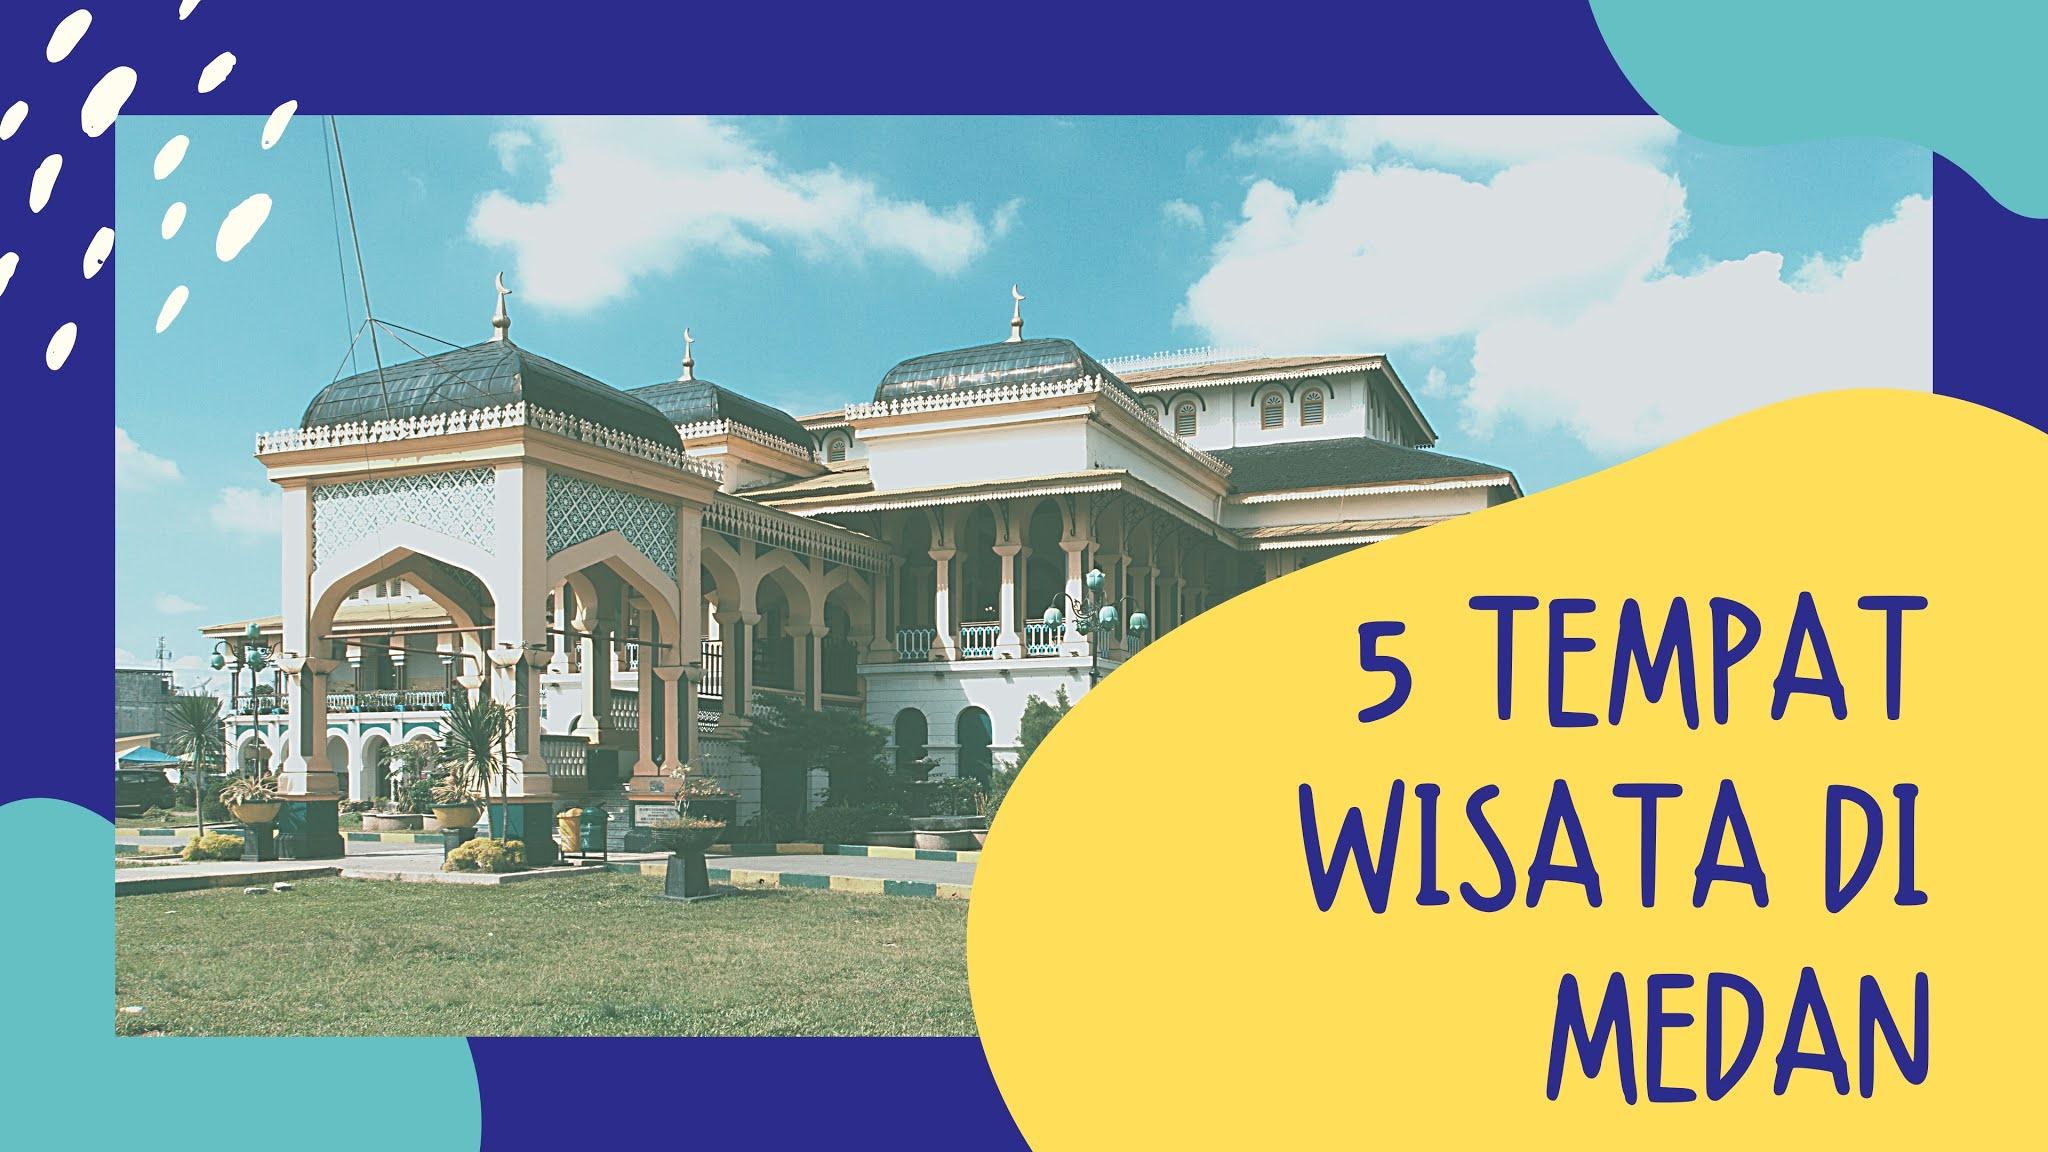 5 tempat wisata terkenal di Medan